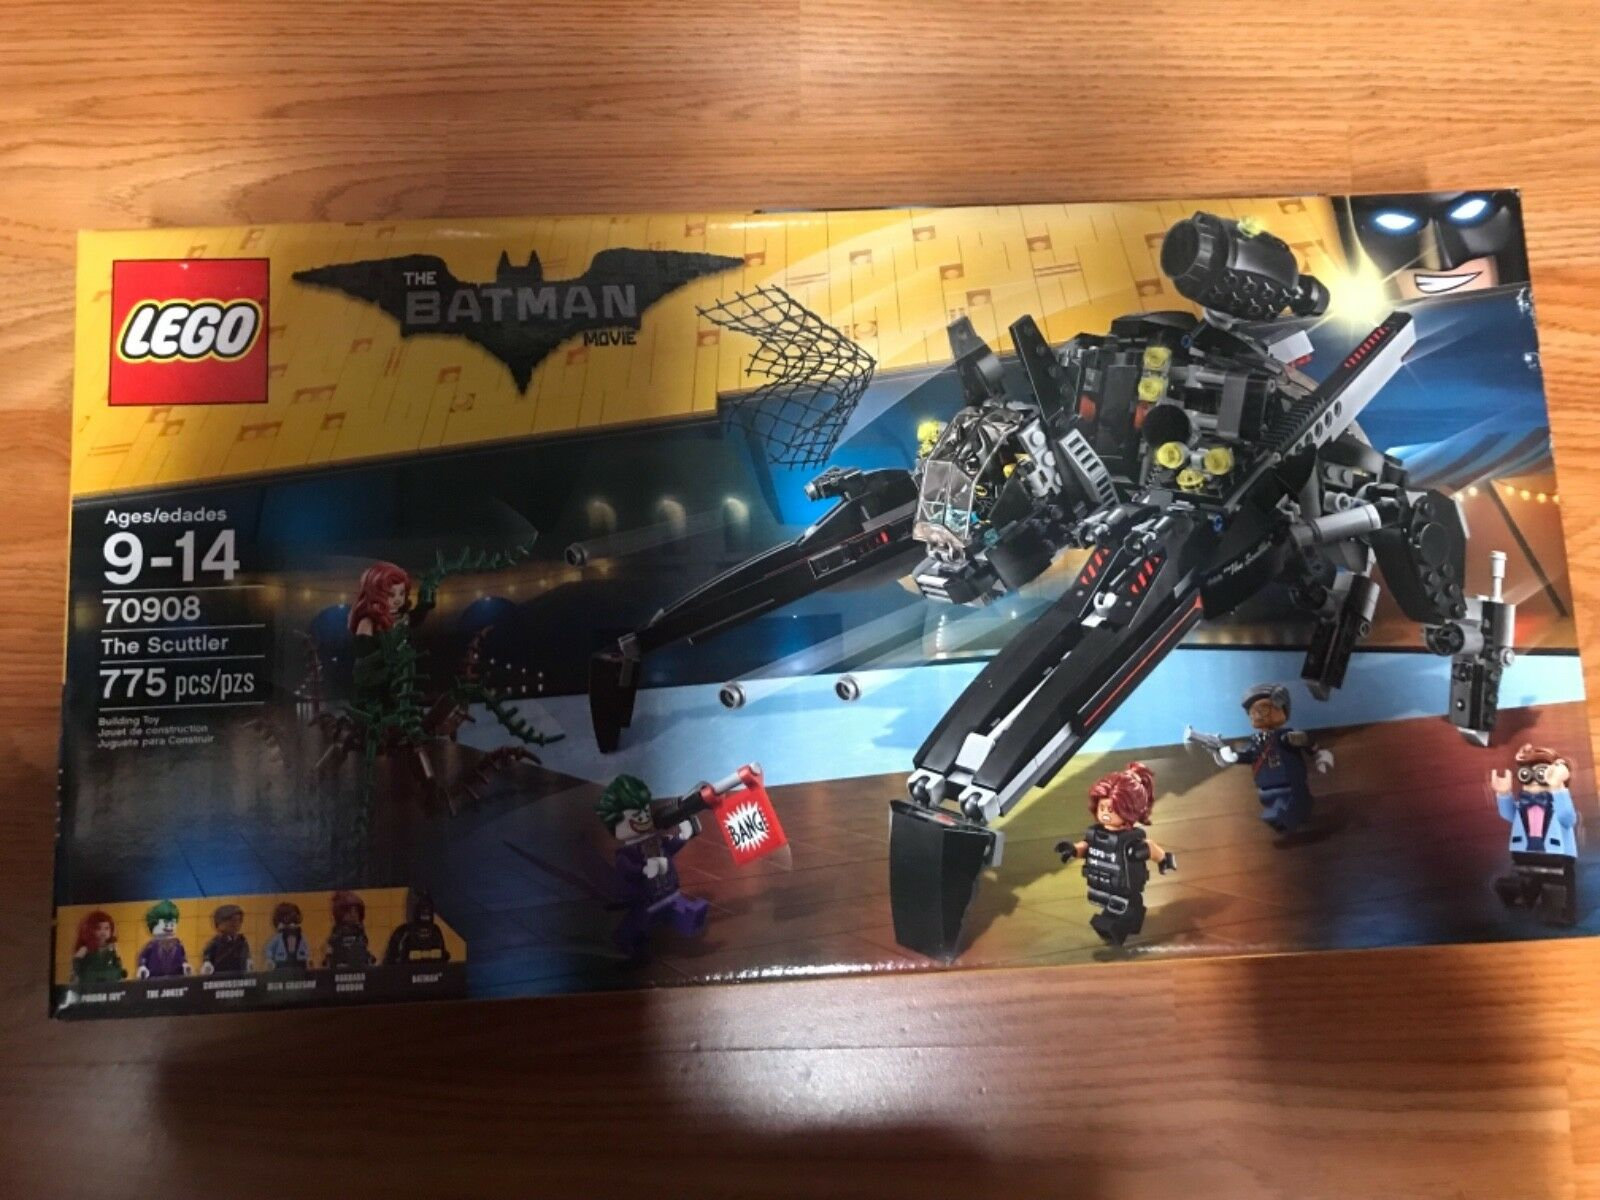 Scuttler The Movie Batman 70908 Lego SUqMzVp